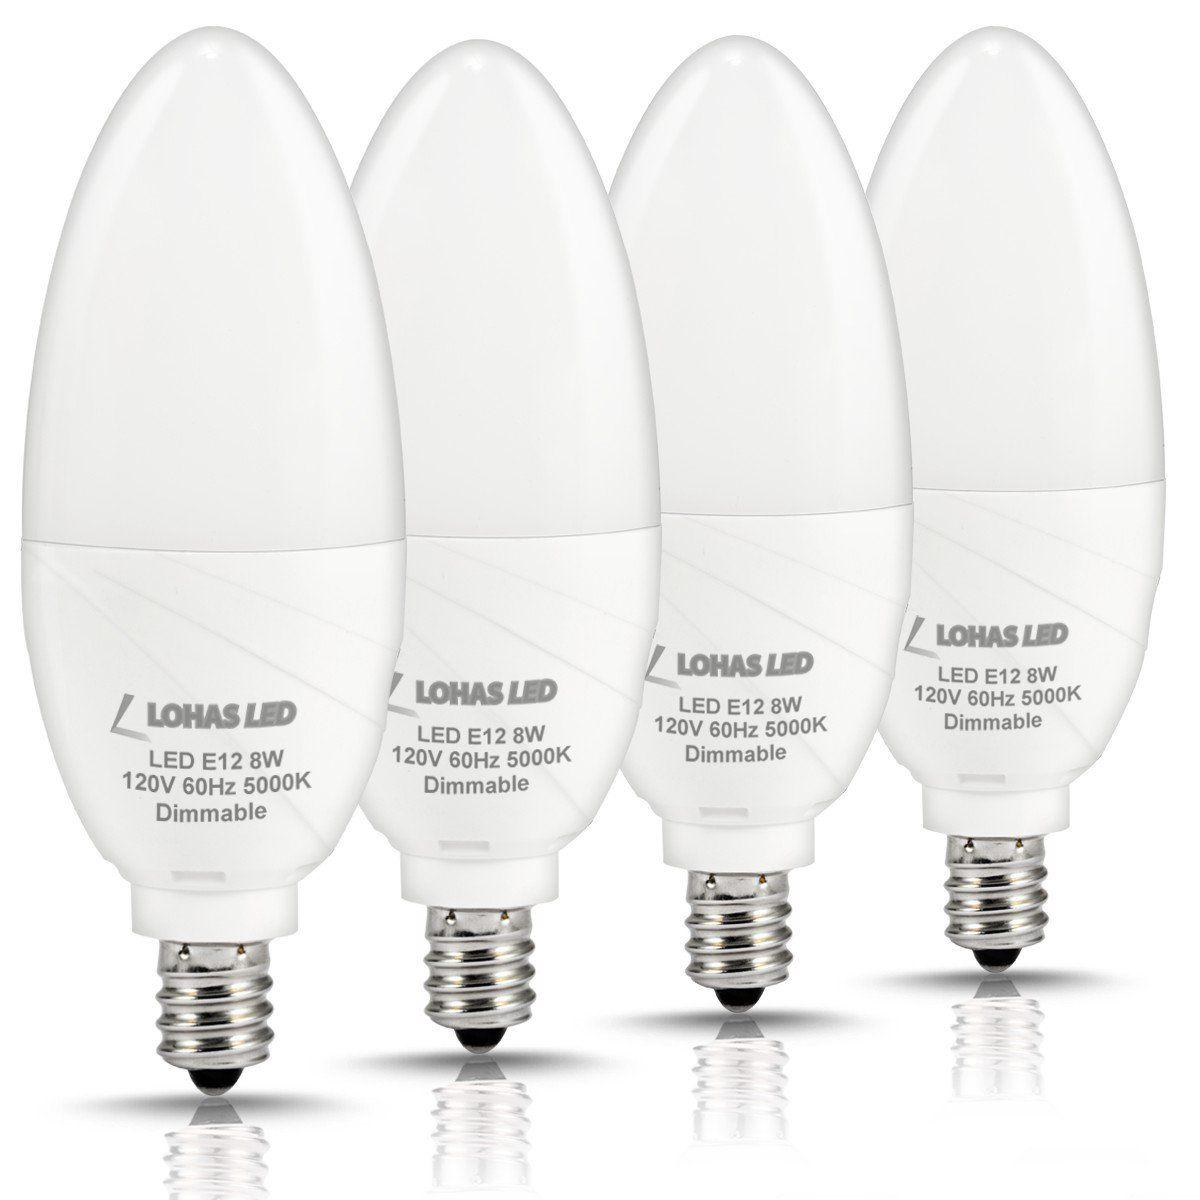 Lohas Led Candelabra Bulb Dimmable 75watt Light Bulbs Equivalent 8w Daylight 5000k 750lm E12 Base Chandelier Ceiling Fan Lamps For Home